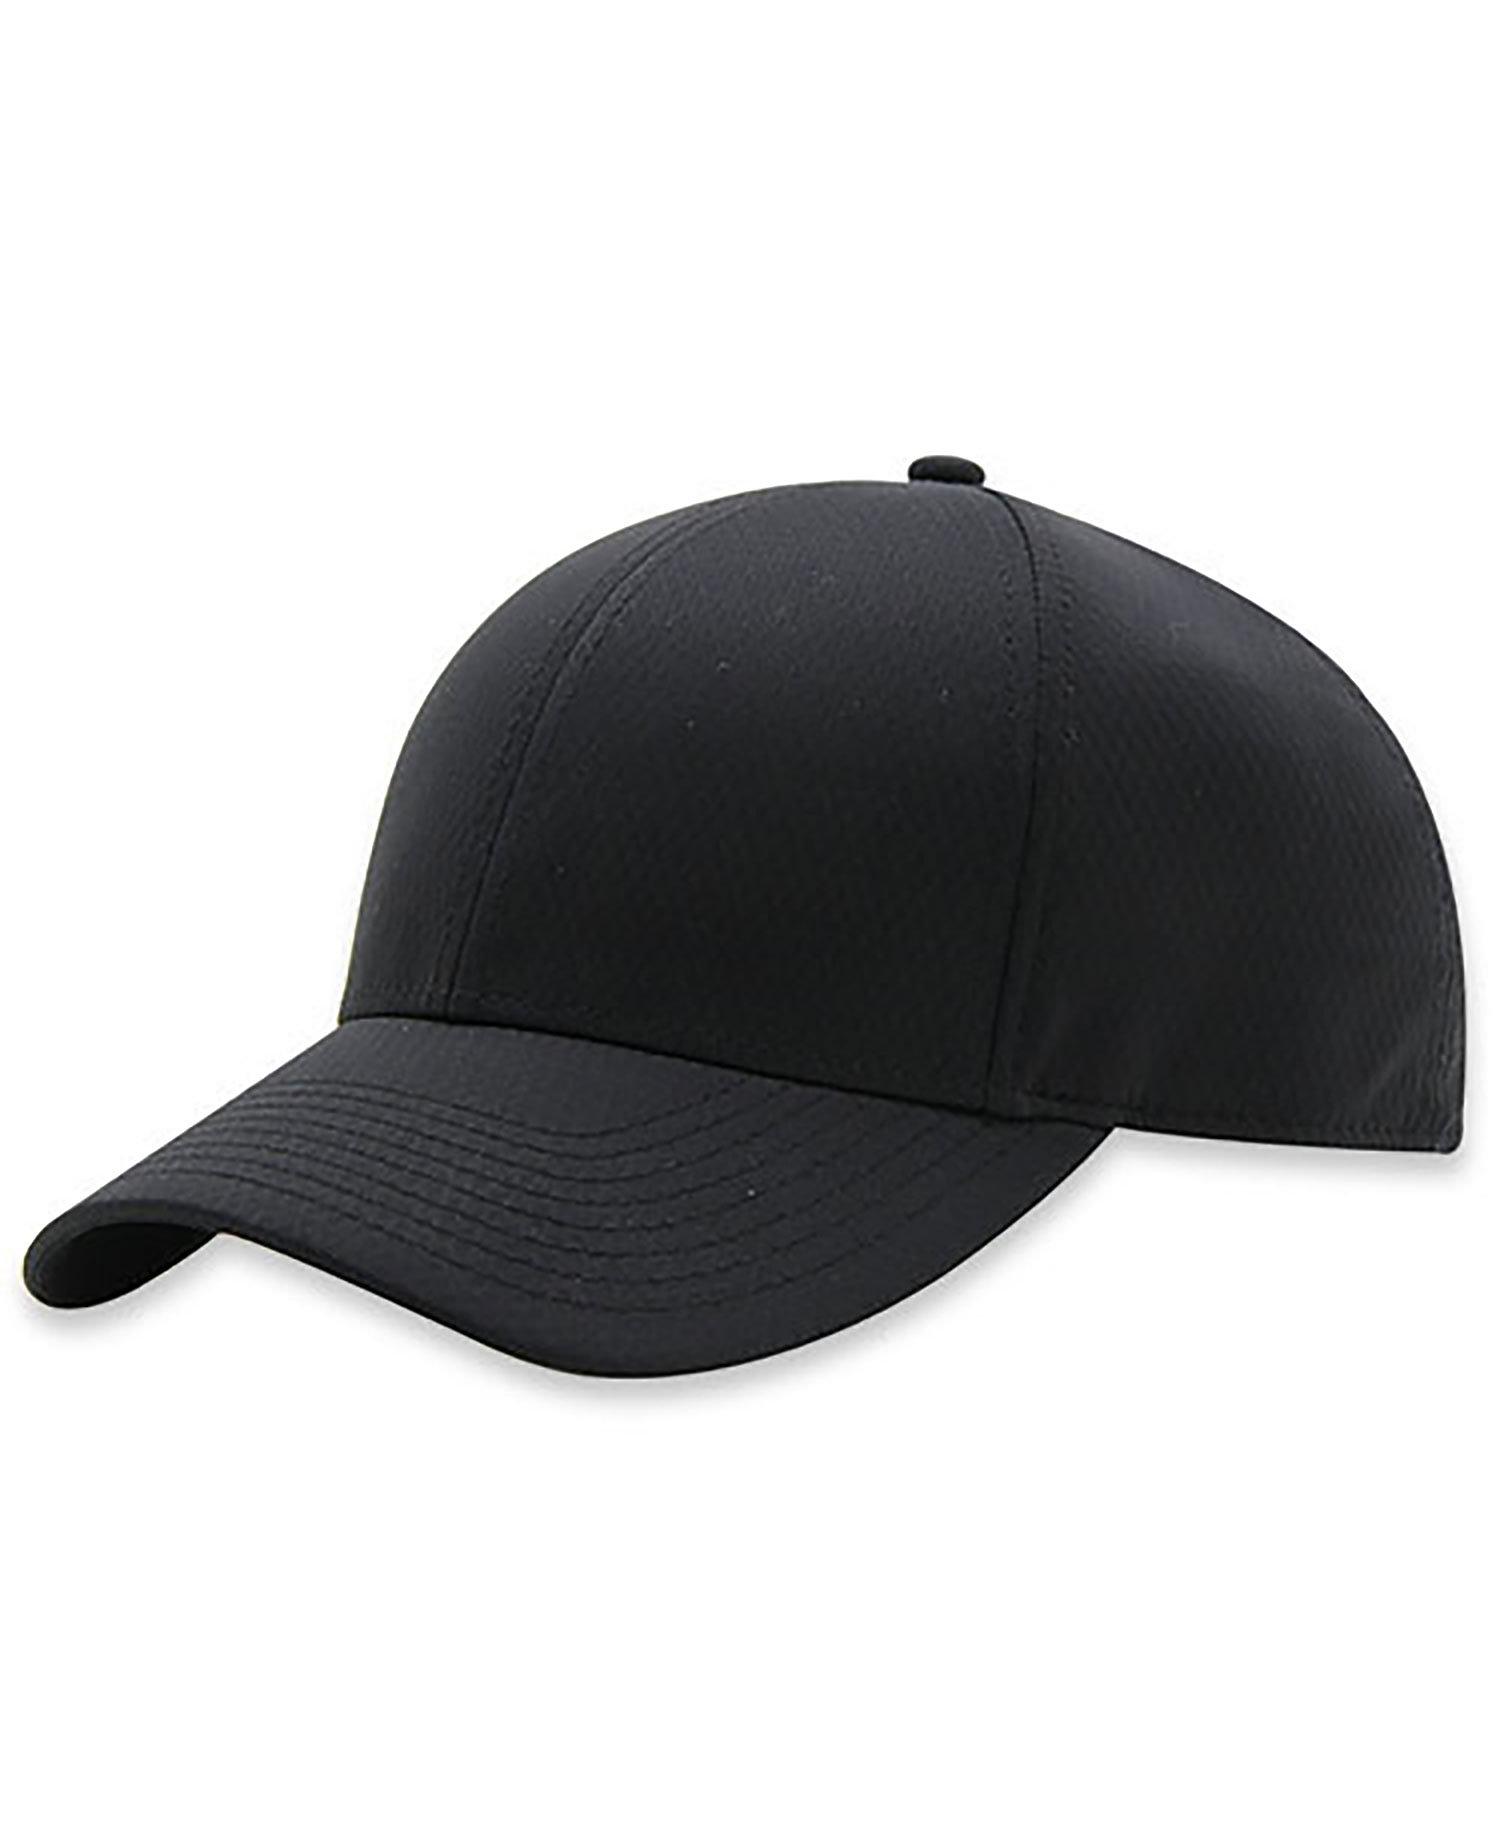 Ouray 51326 - Diamond Performance Cap